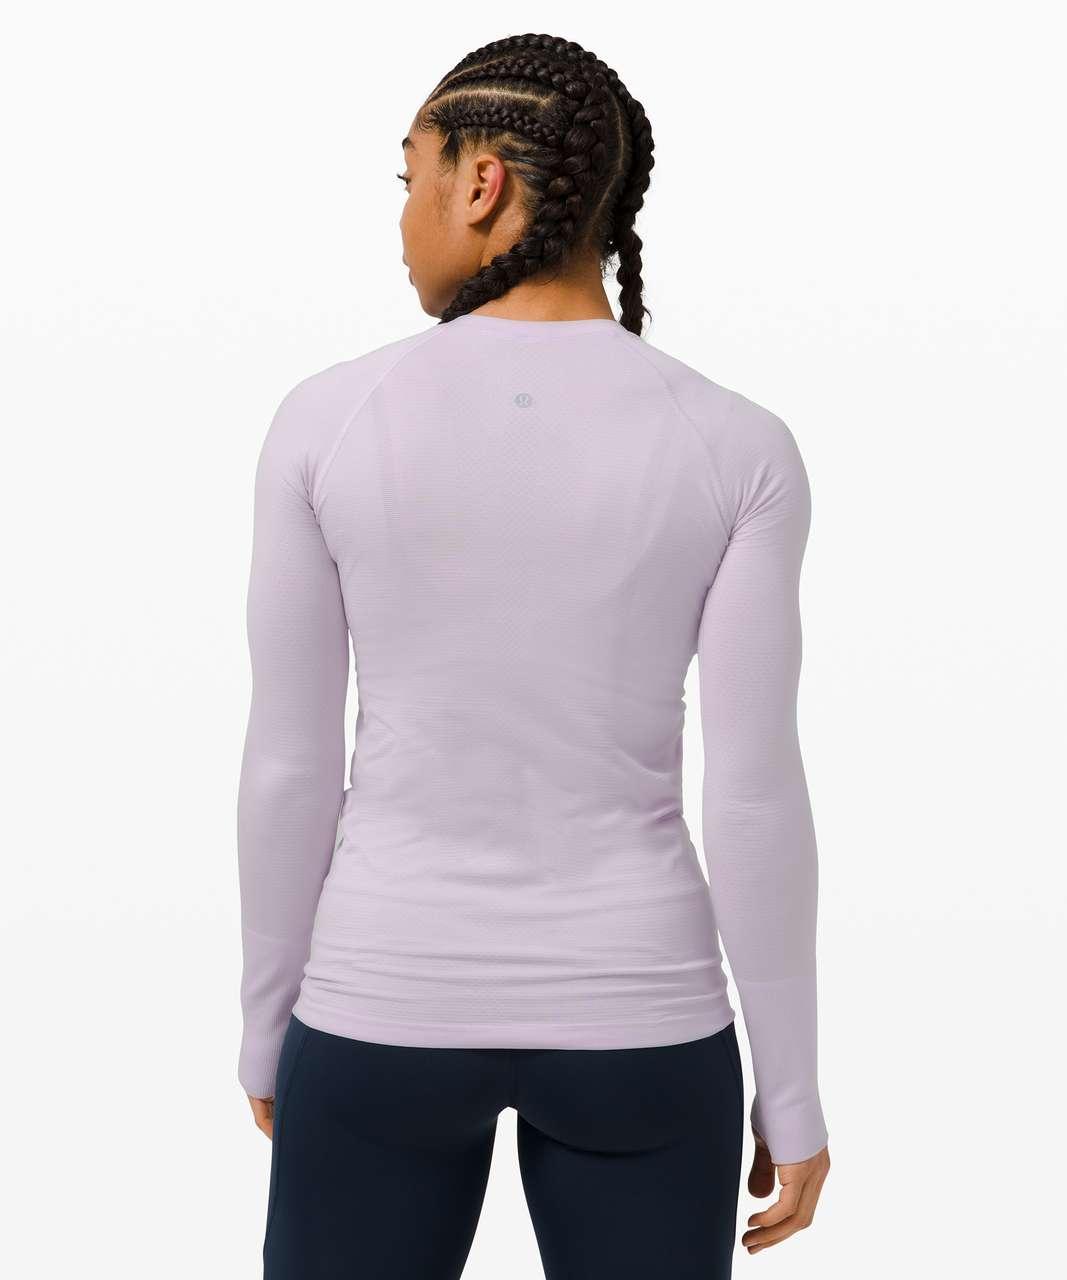 Lululemon Swiftly Tech Long Sleeve 2.0 - Lavender Dew / Lavender Dew